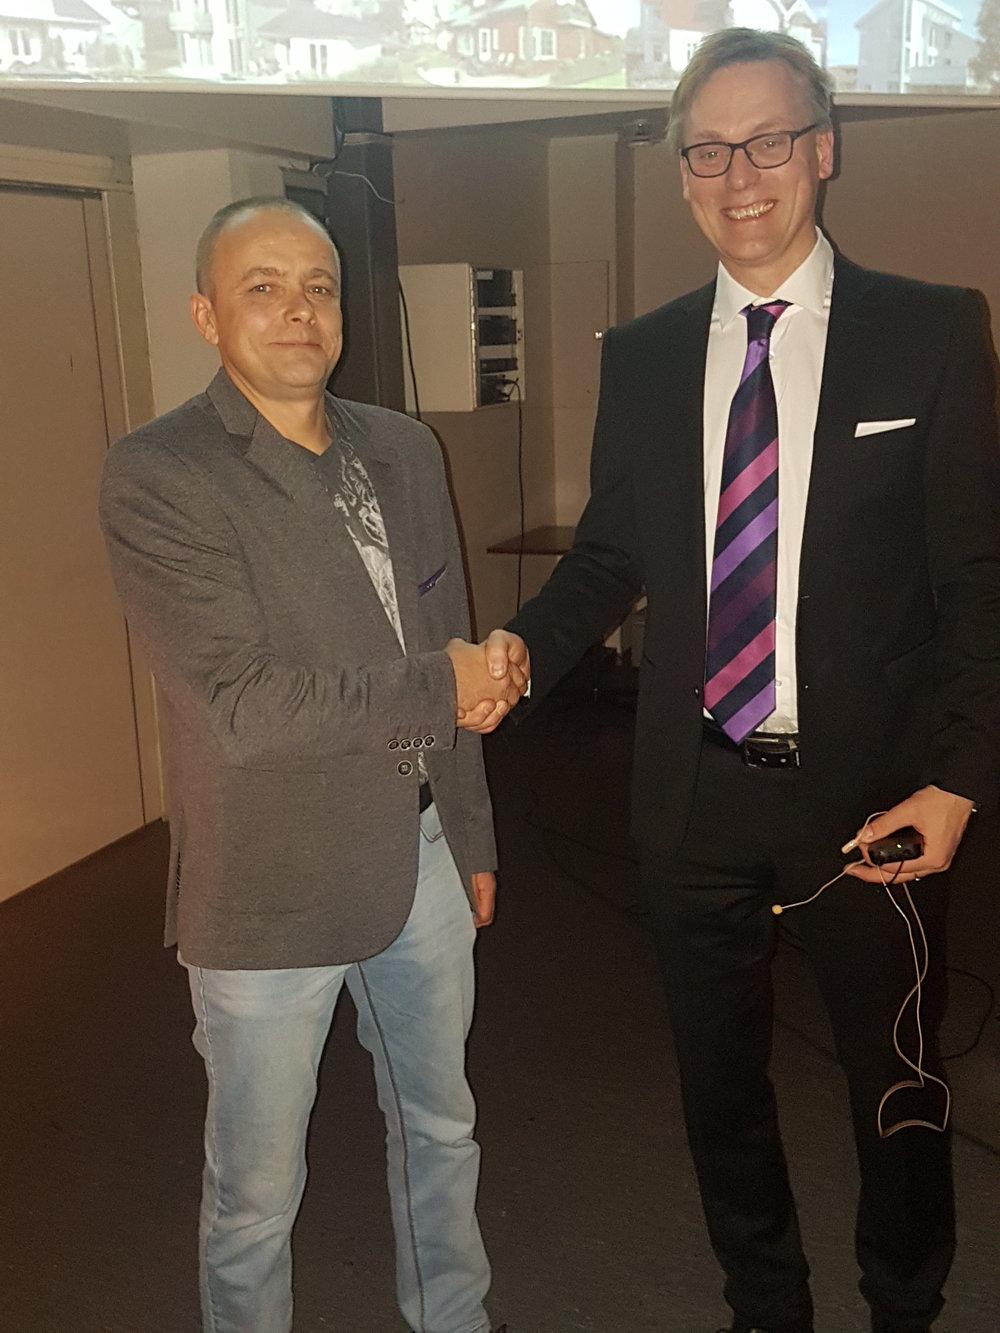 Romas Daunys (tv) fekk overrekt prisen frådagleg leiar Henning Heltne på årets julebord.